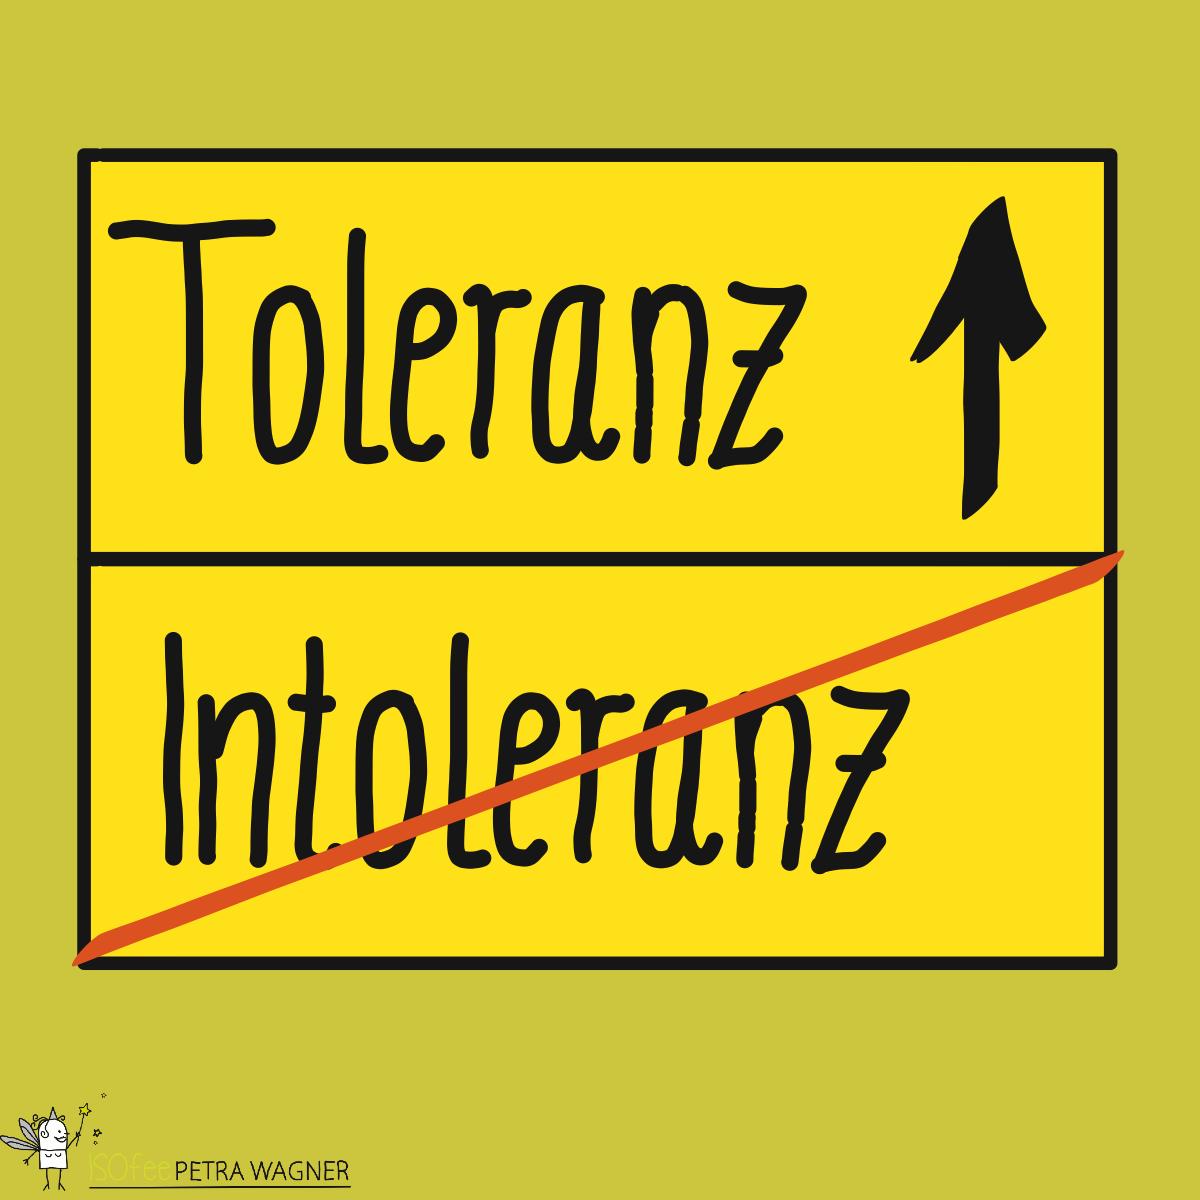 Toleranz als Kompetenz - ISOfee.eu